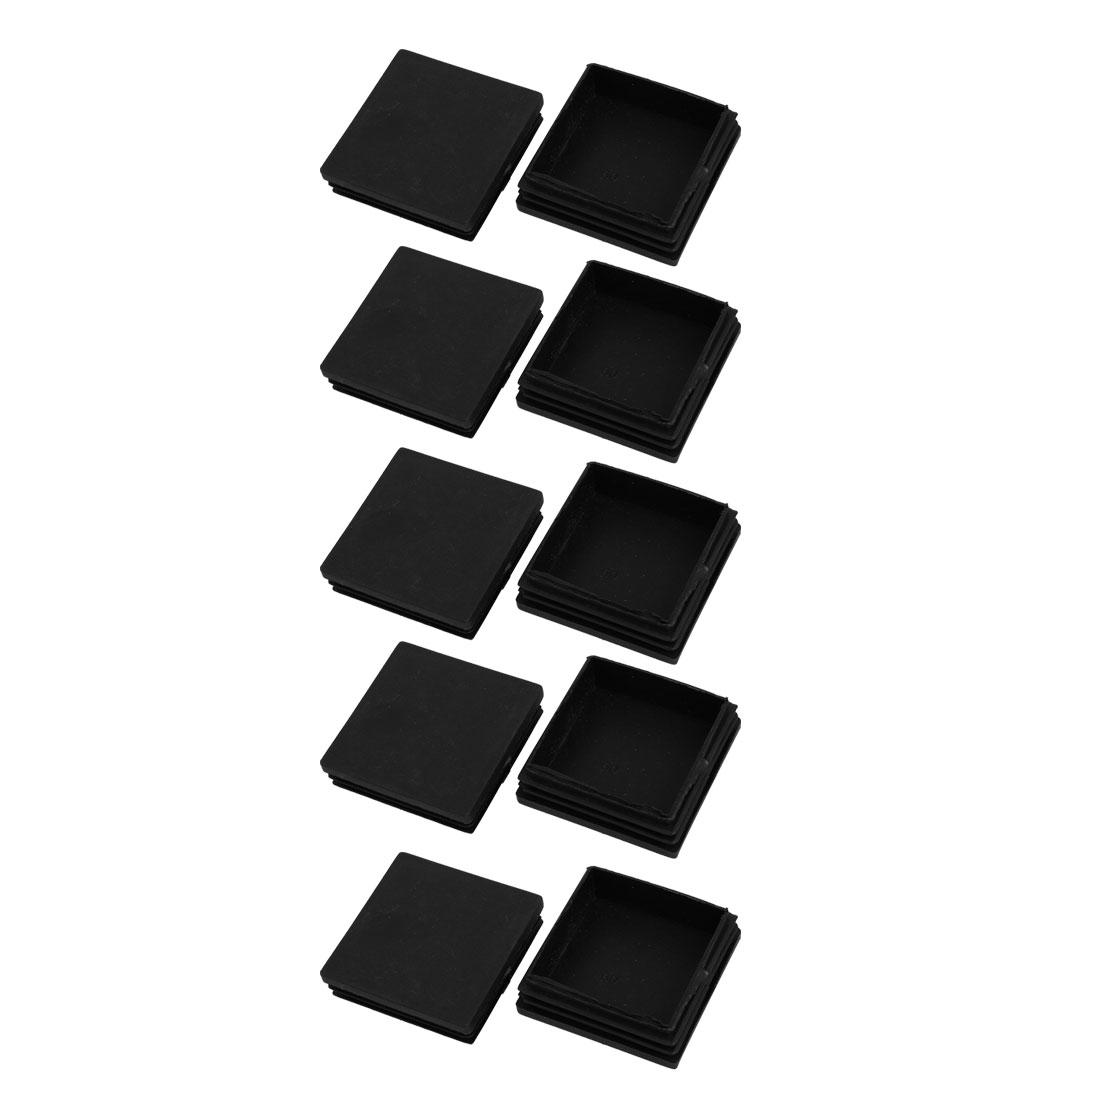 10pcs 60x60mm Black Plastic Square Cabinet Leg Insert Cover Protector